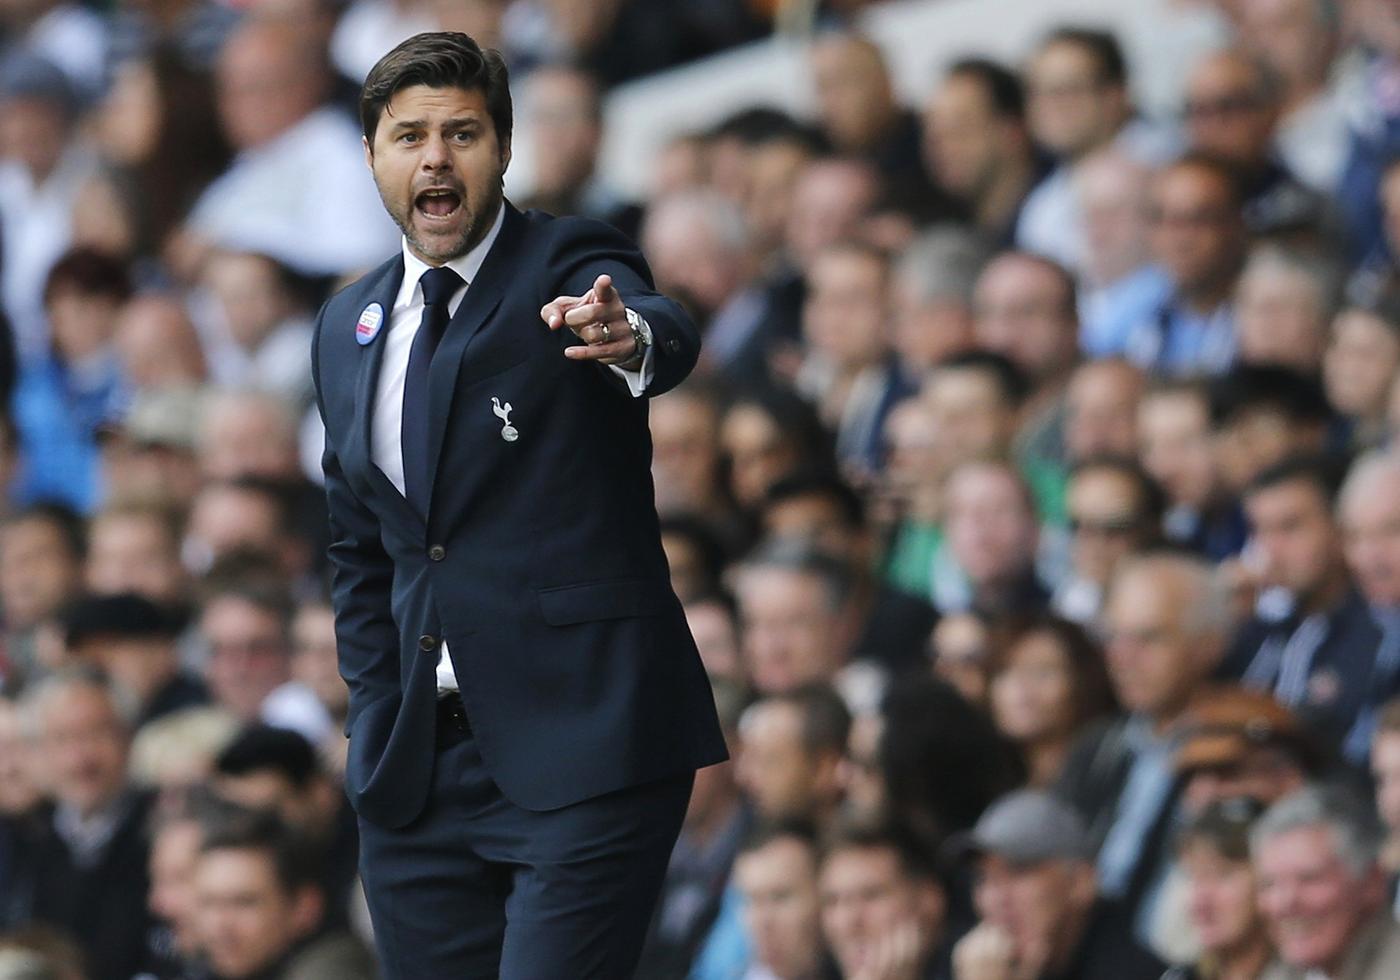 Five ways Mauricio Pochettino can build on his solid start at Tottenham Hotspur